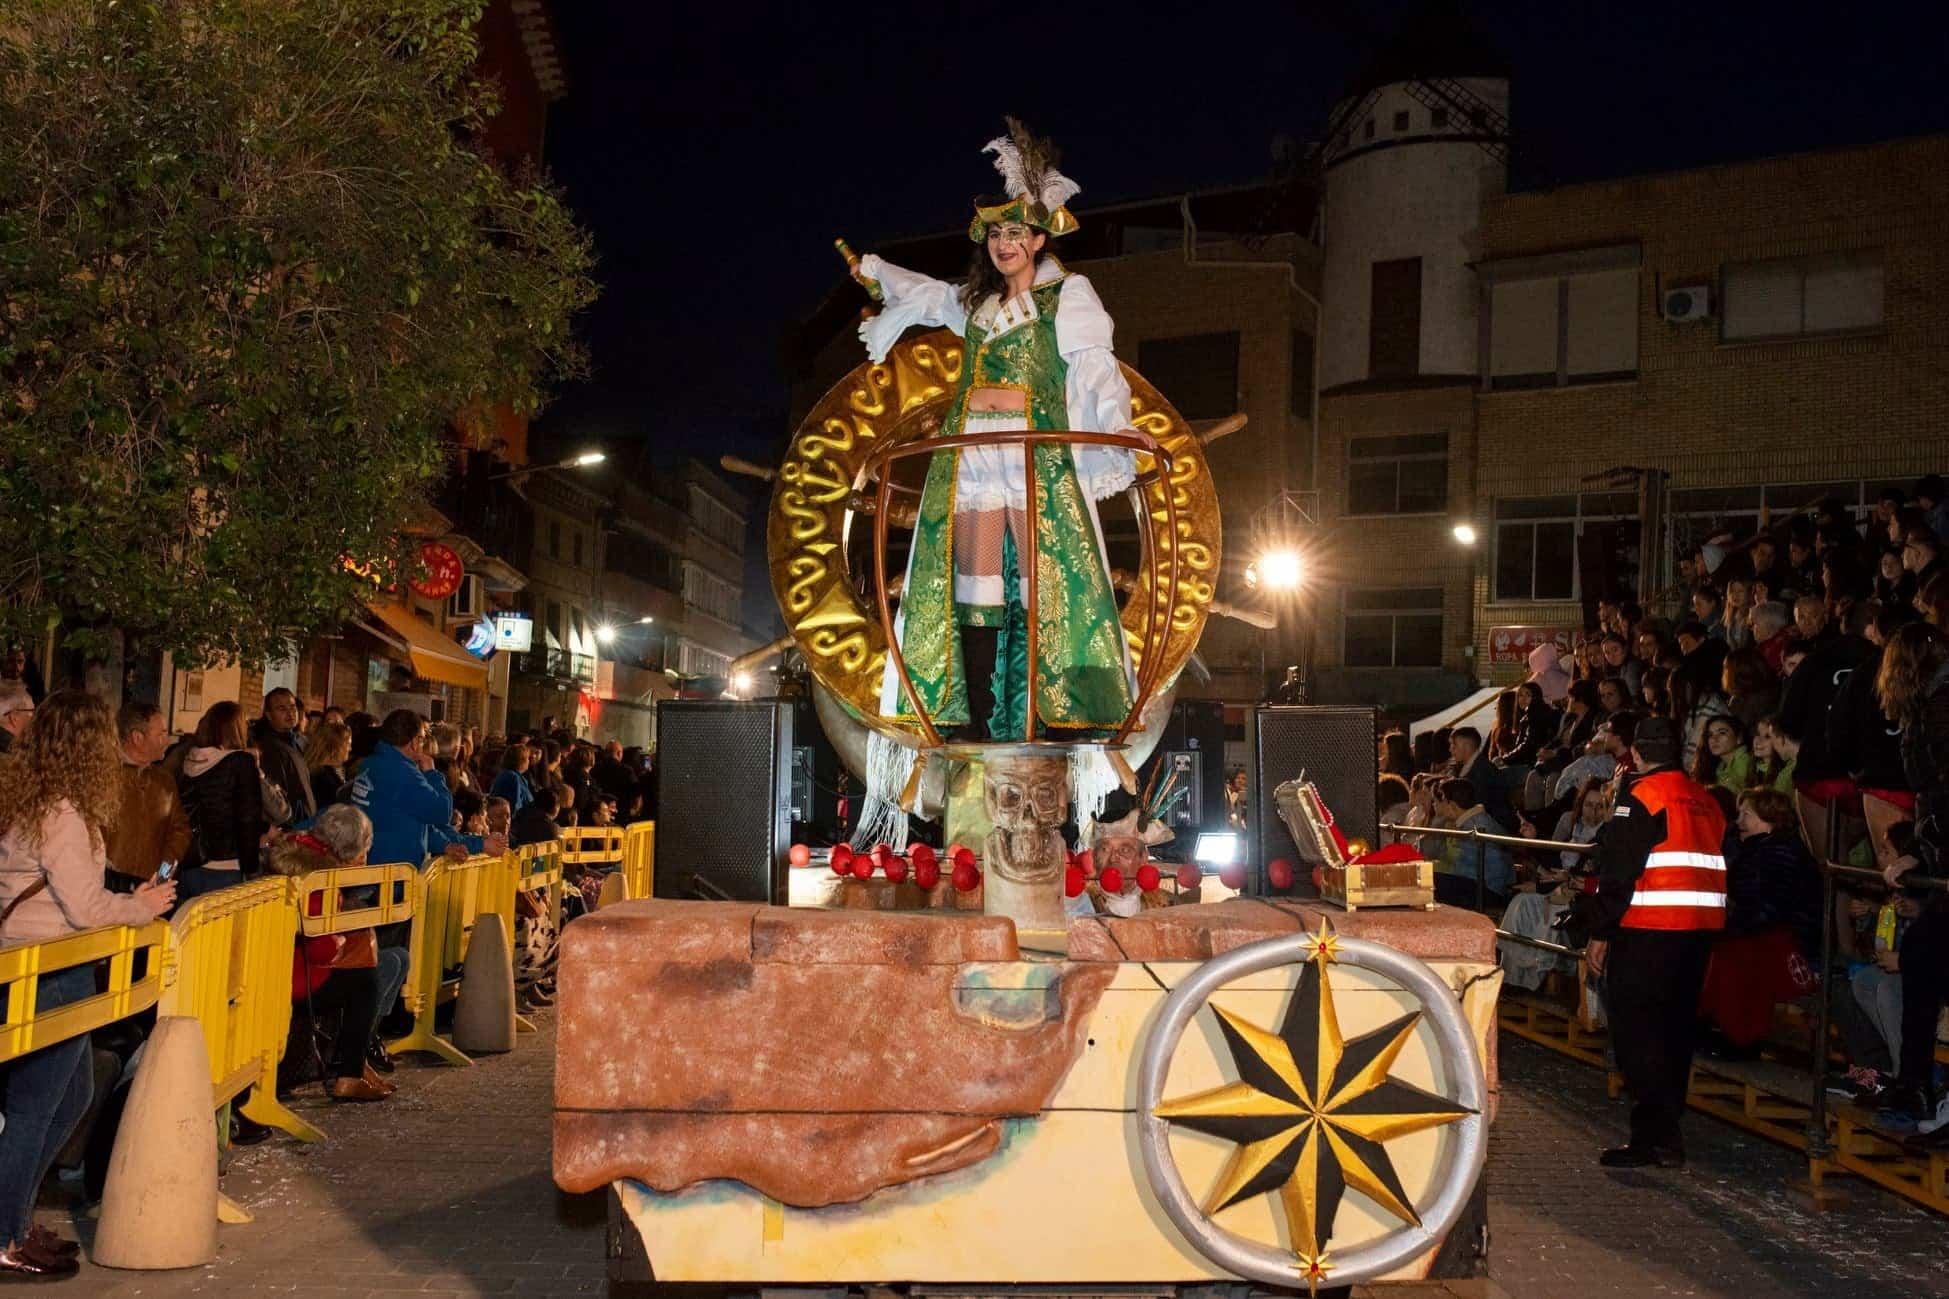 Carnaval de herencia 2020 ofertorio 145 - Selección de fotografías del Ofertorio del Carnaval de Herencia